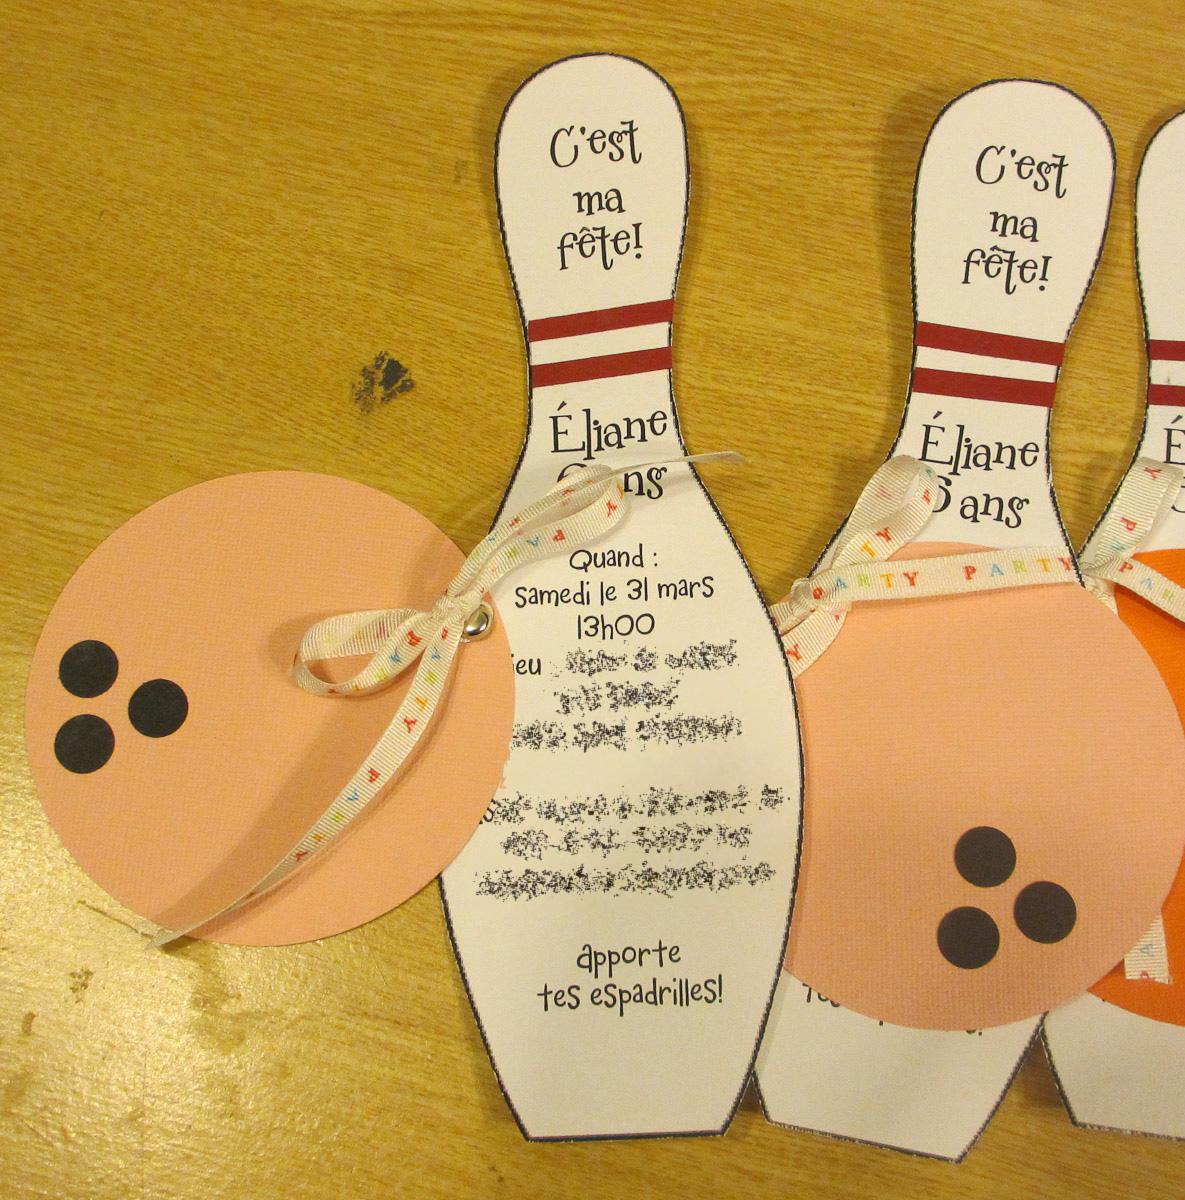 Diy birthday invitations nelidesign bowling birthday invitations party free template printable stopboris Gallery